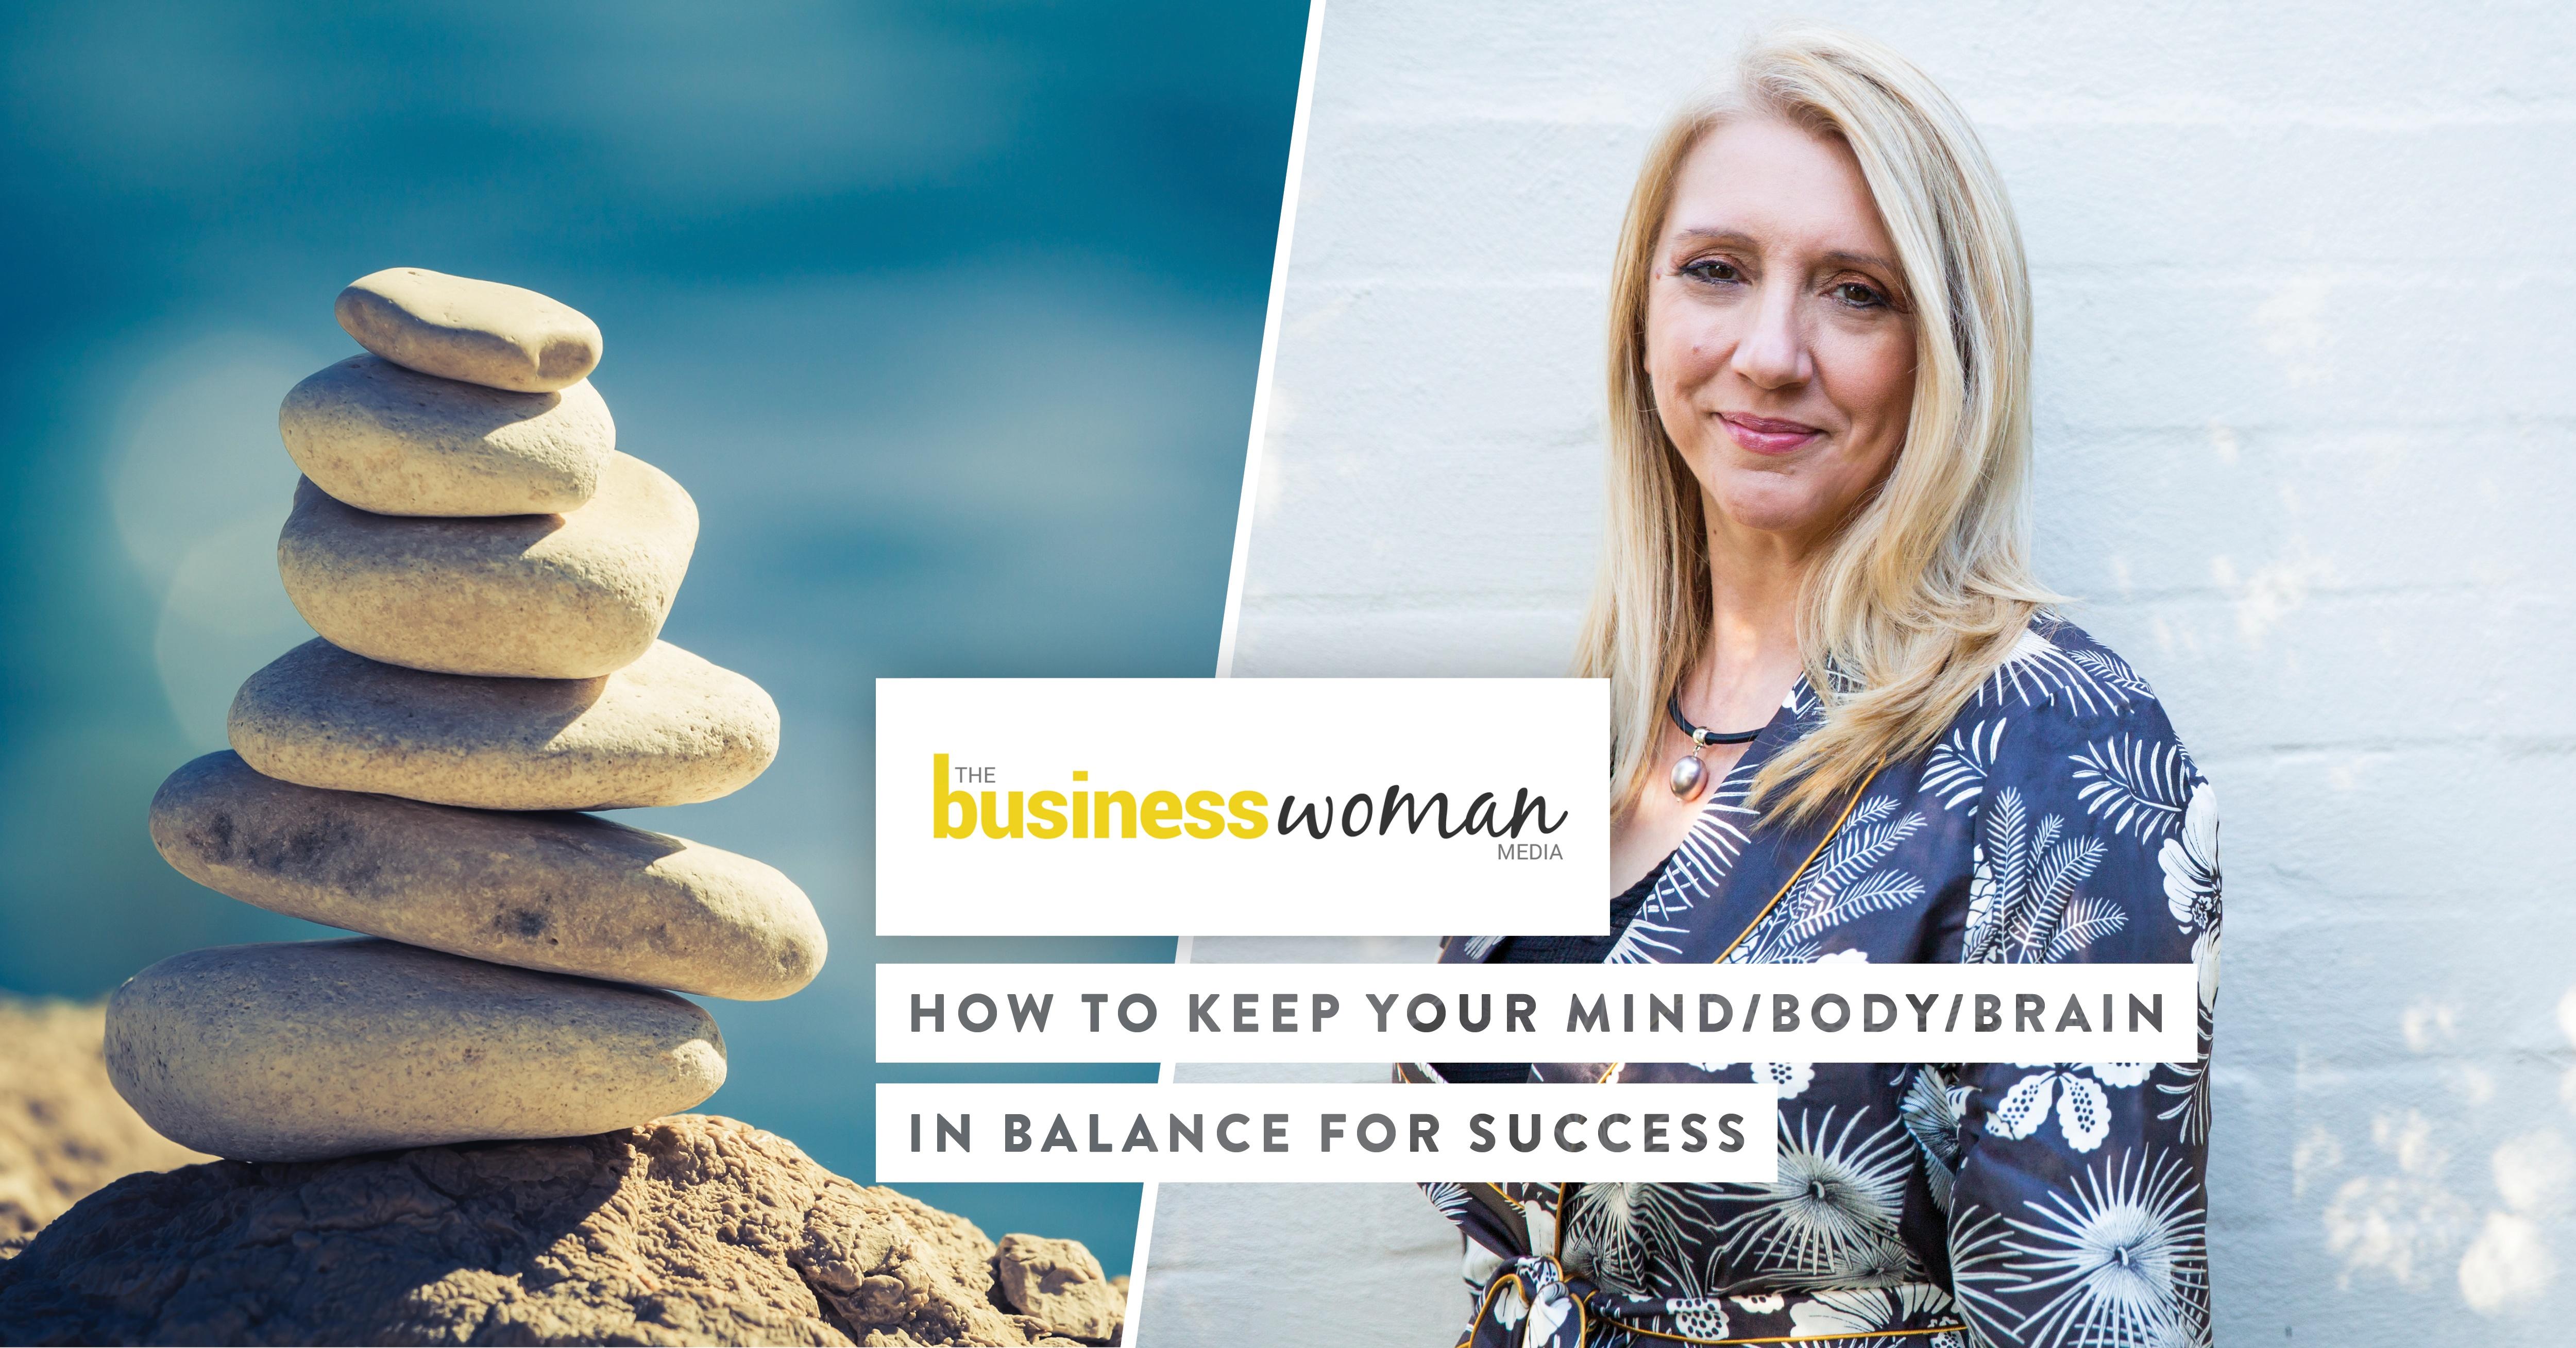 business-woman-media-keep-mind-body-brain-balance-success